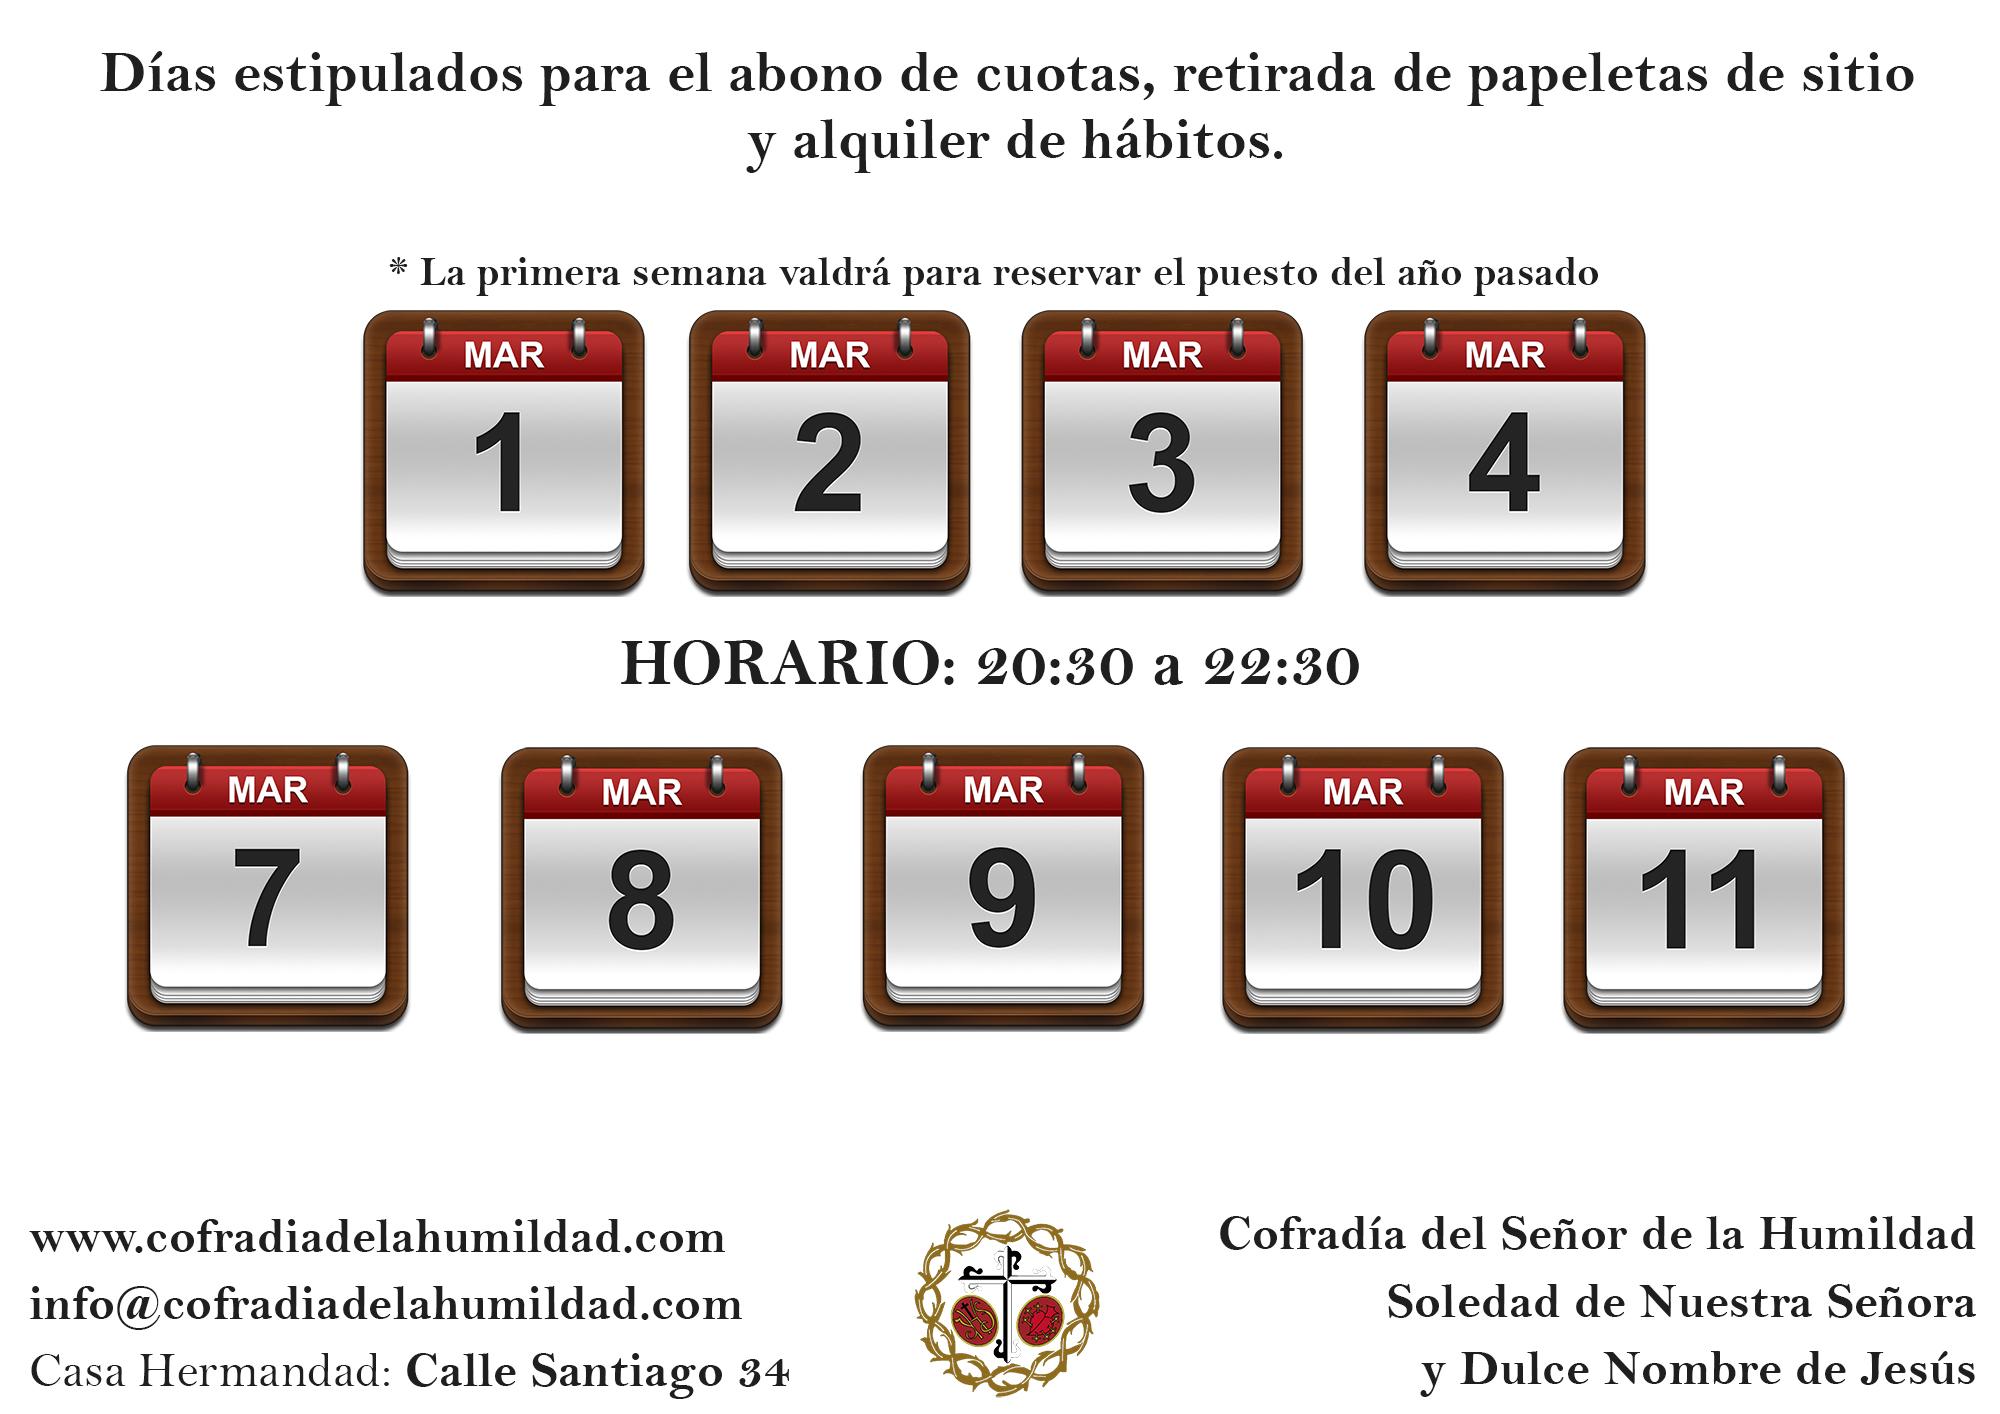 Calendario para la retirada de papeletas de sitio